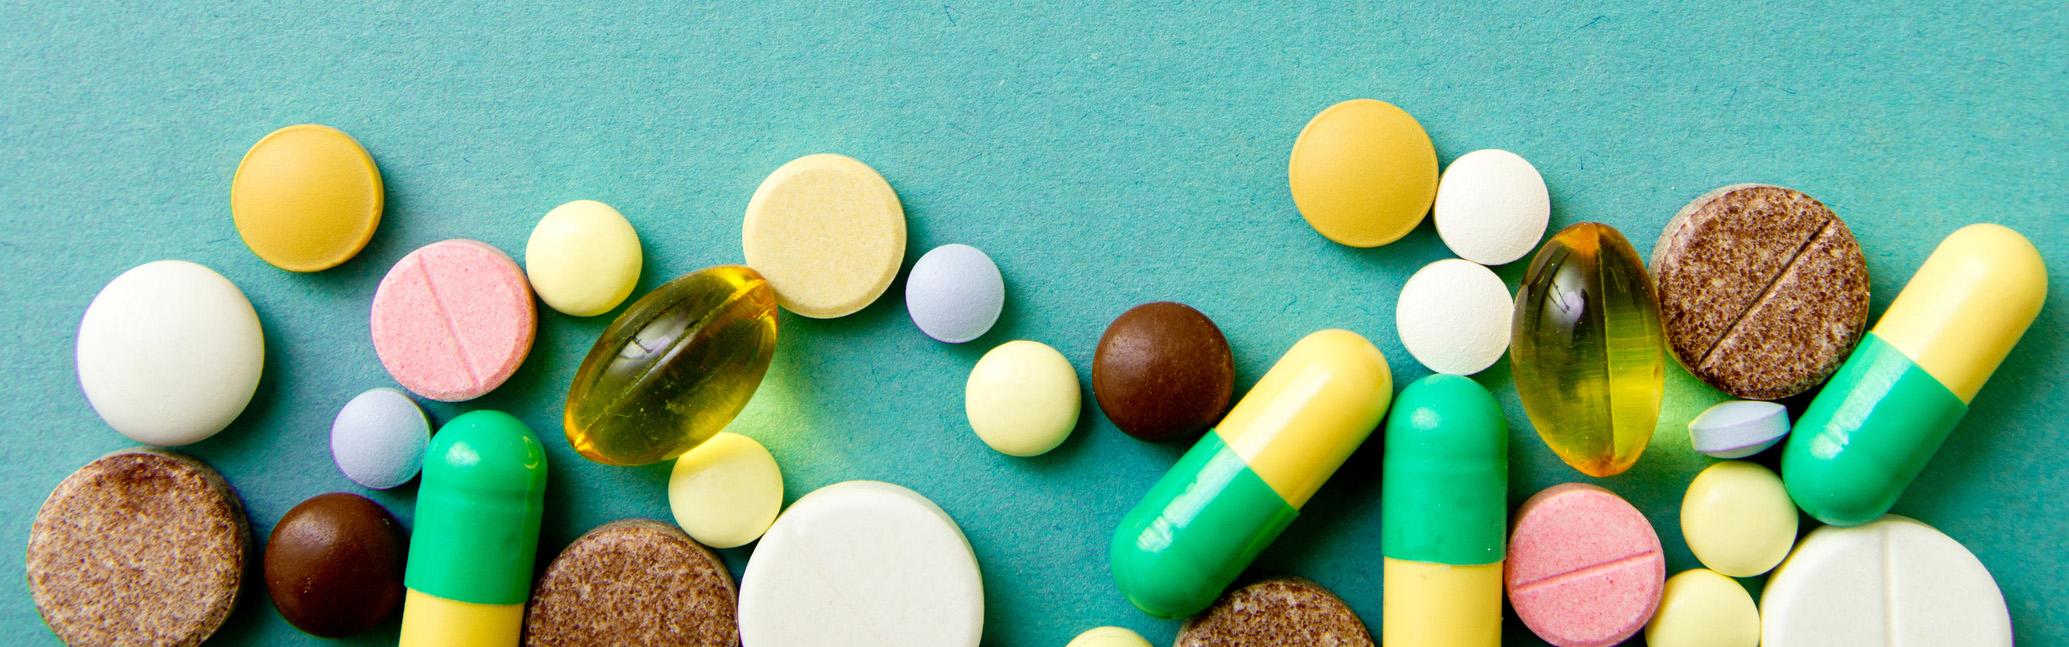 Best Iron Supplements During Pregnancy